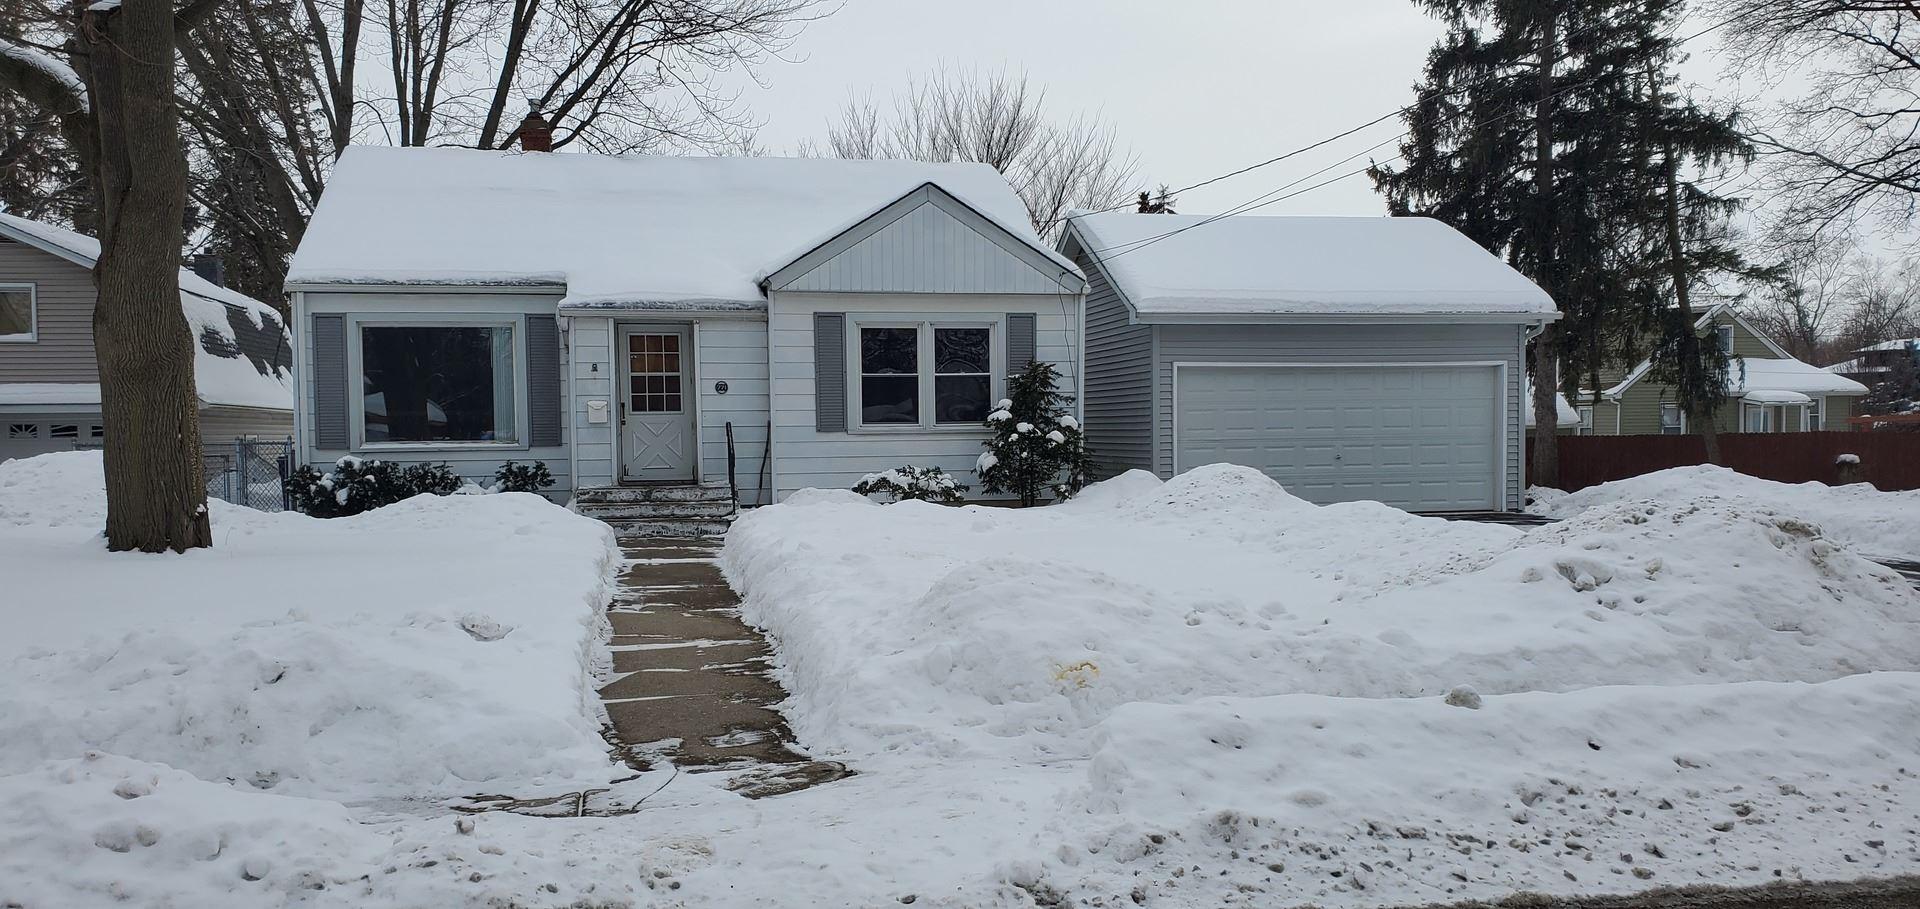 771 Pine Street, Elgin, IL 60123 - #: 10997702